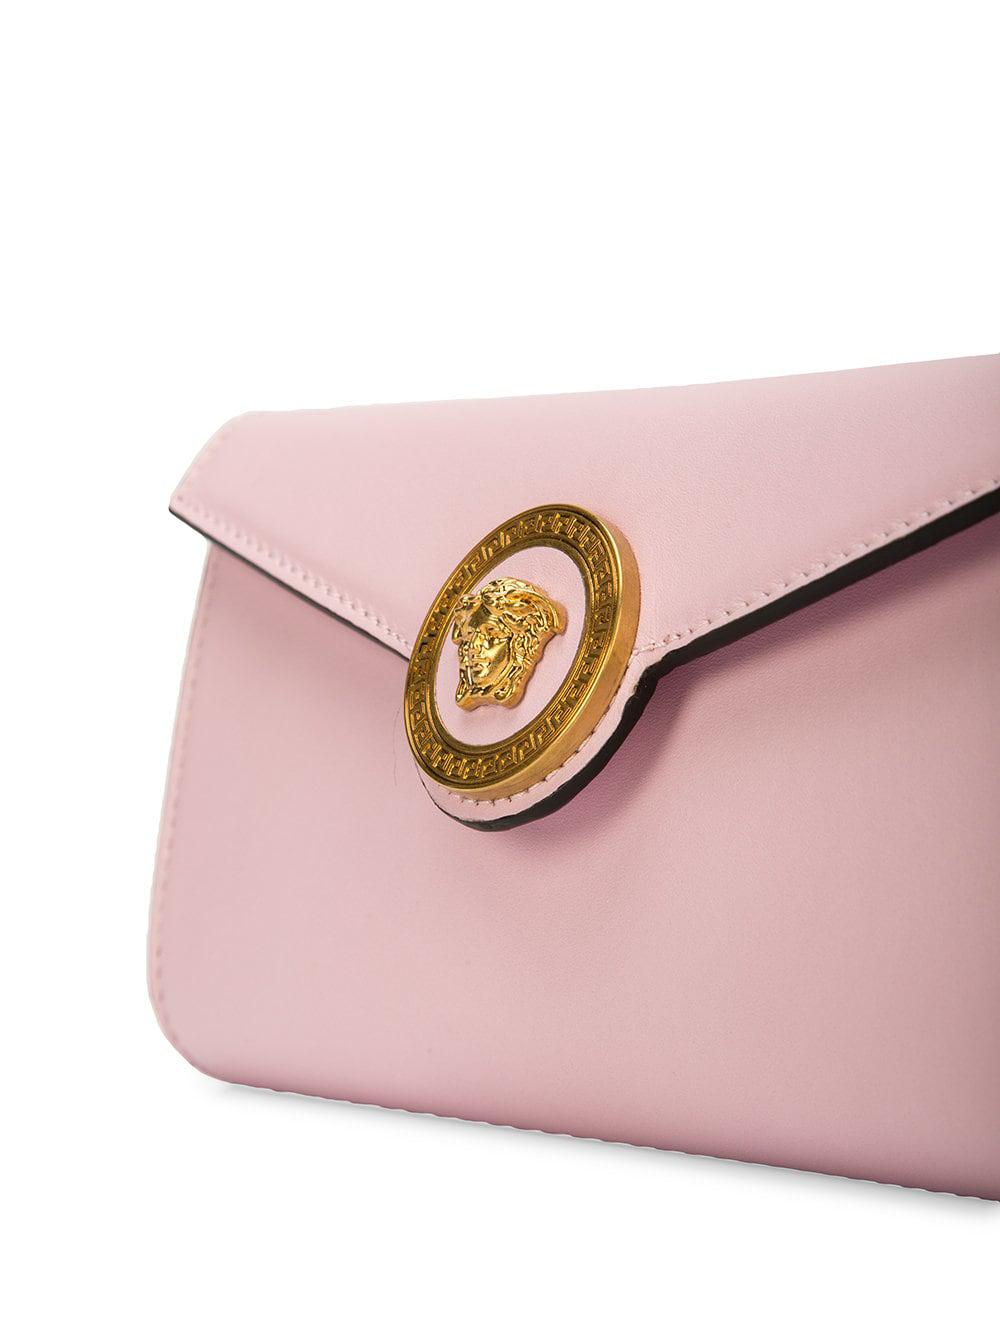 deab5188c5 Versace - Pink Foldover Medusa Clutch - Lyst. View fullscreen